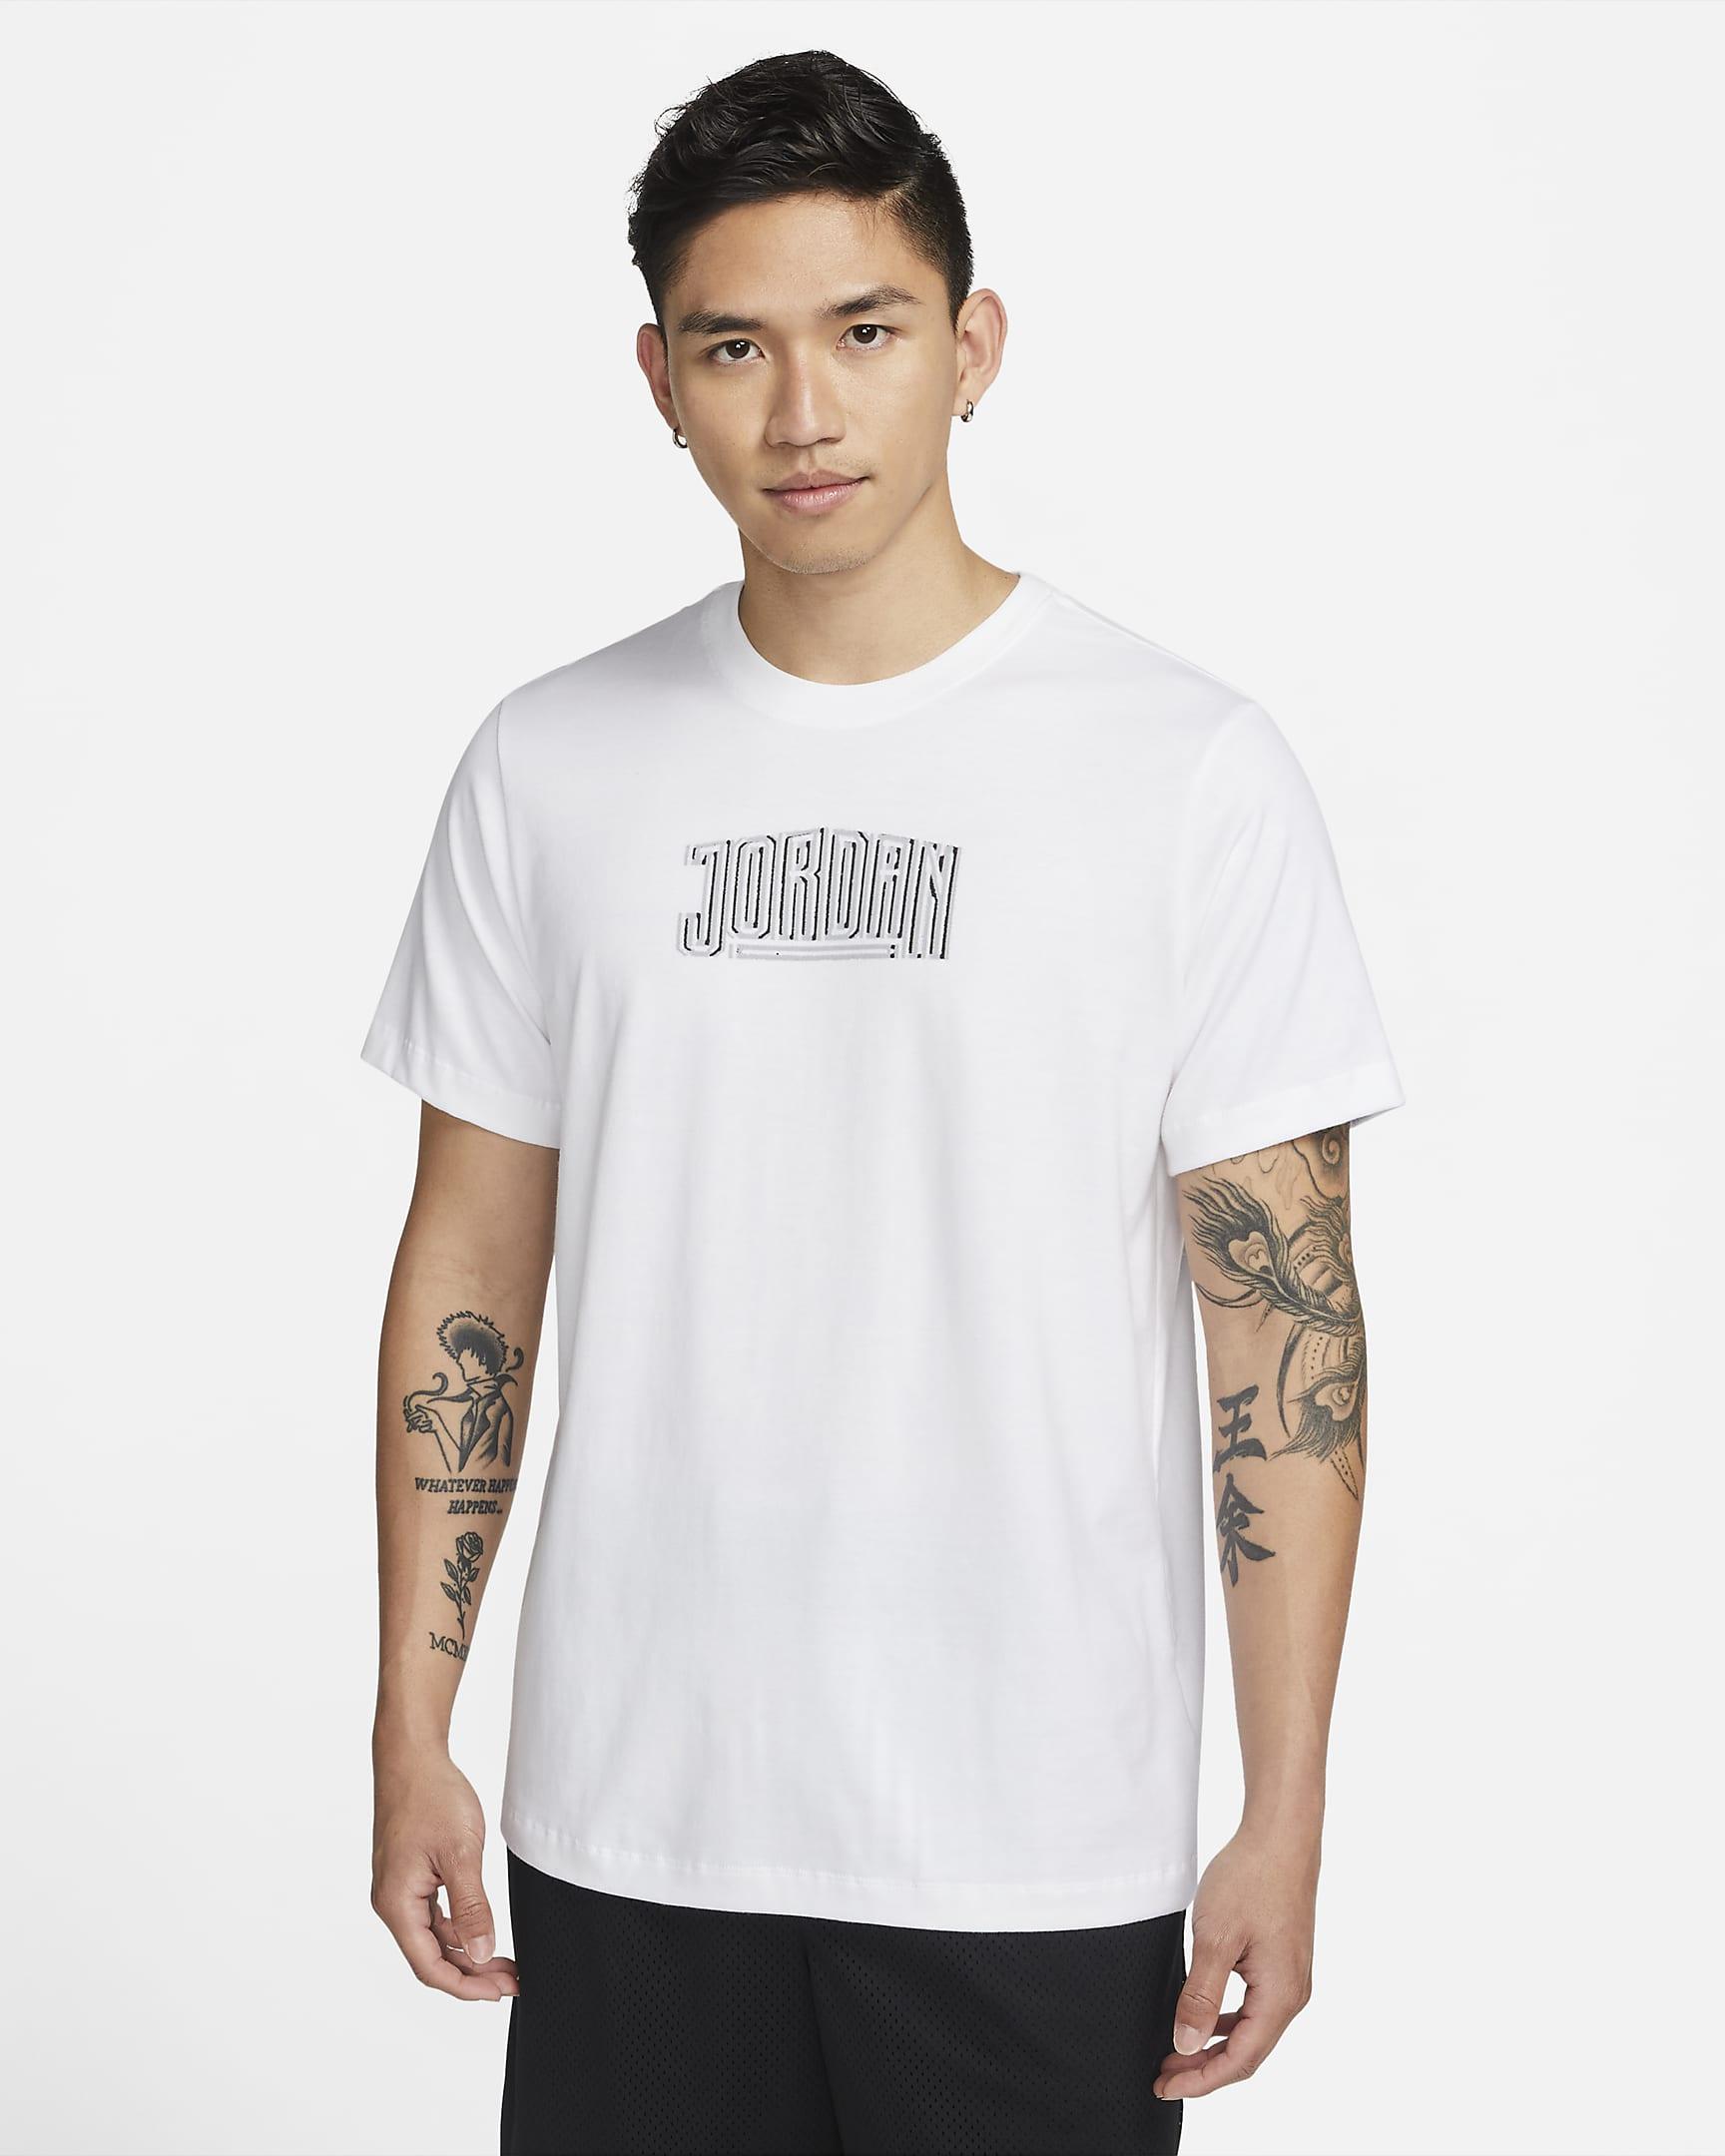 jordan-sport-dna-mens-short-sleeve-t-shirt-5dQJlz.png